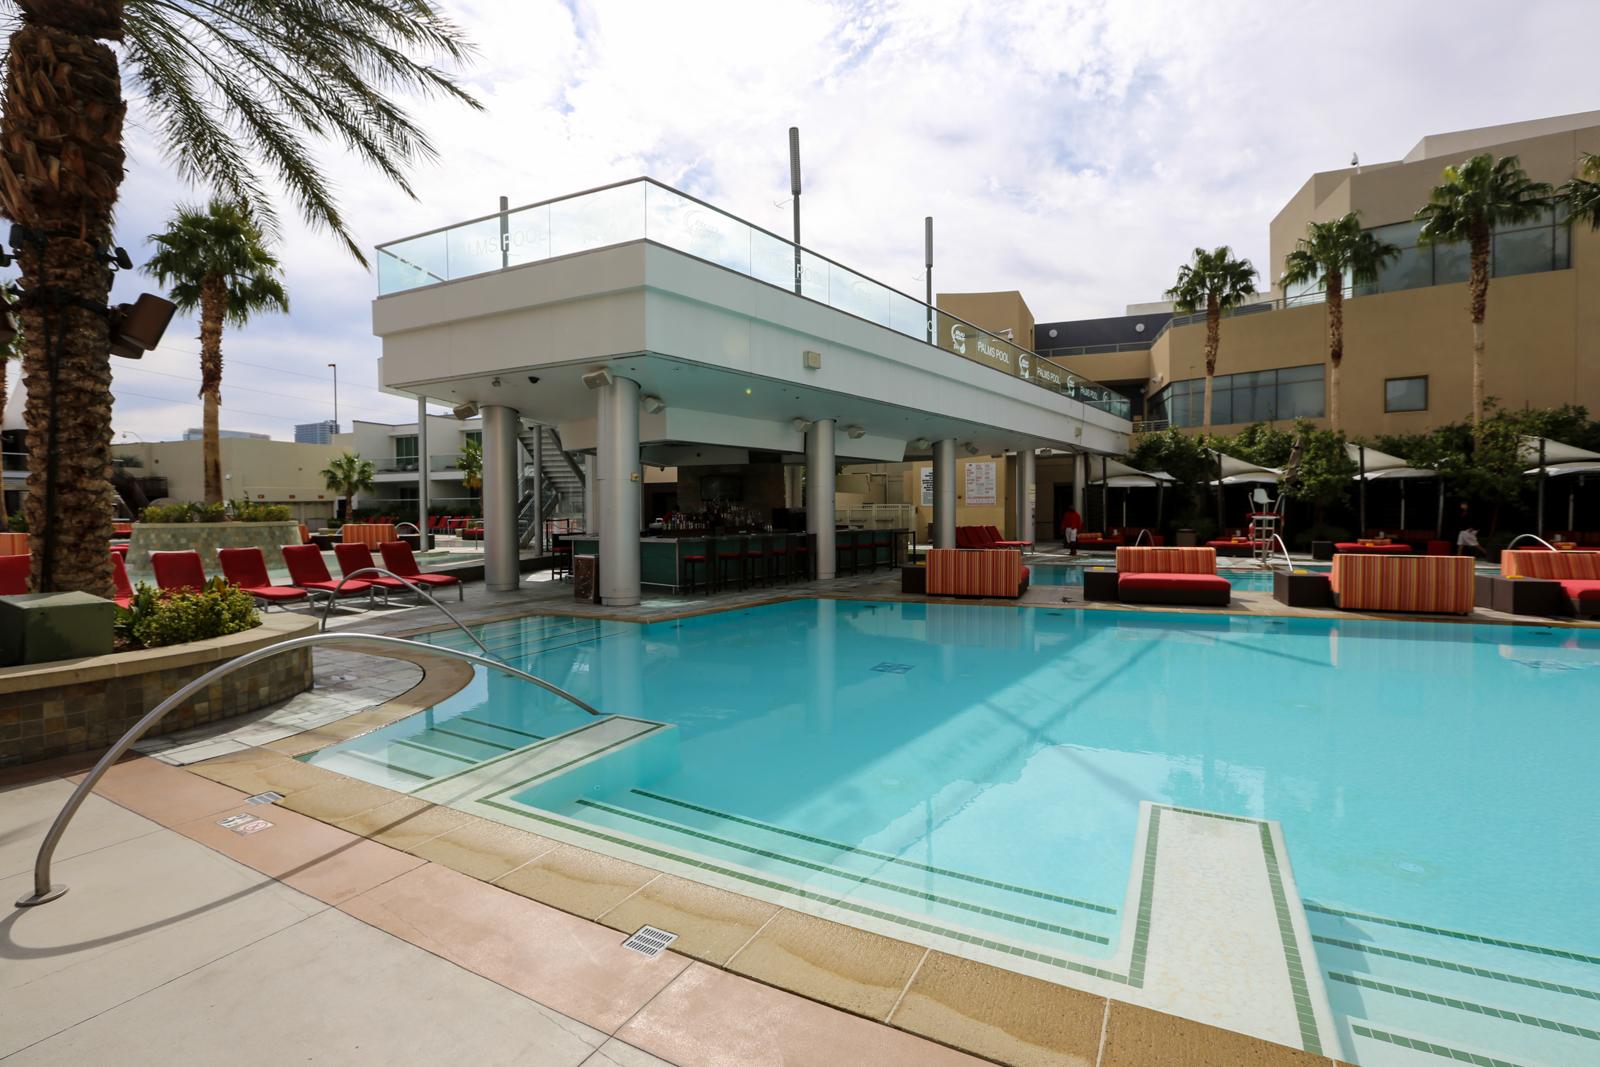 Hotel Resort Review The Palms Casino Hotel Las Vegas